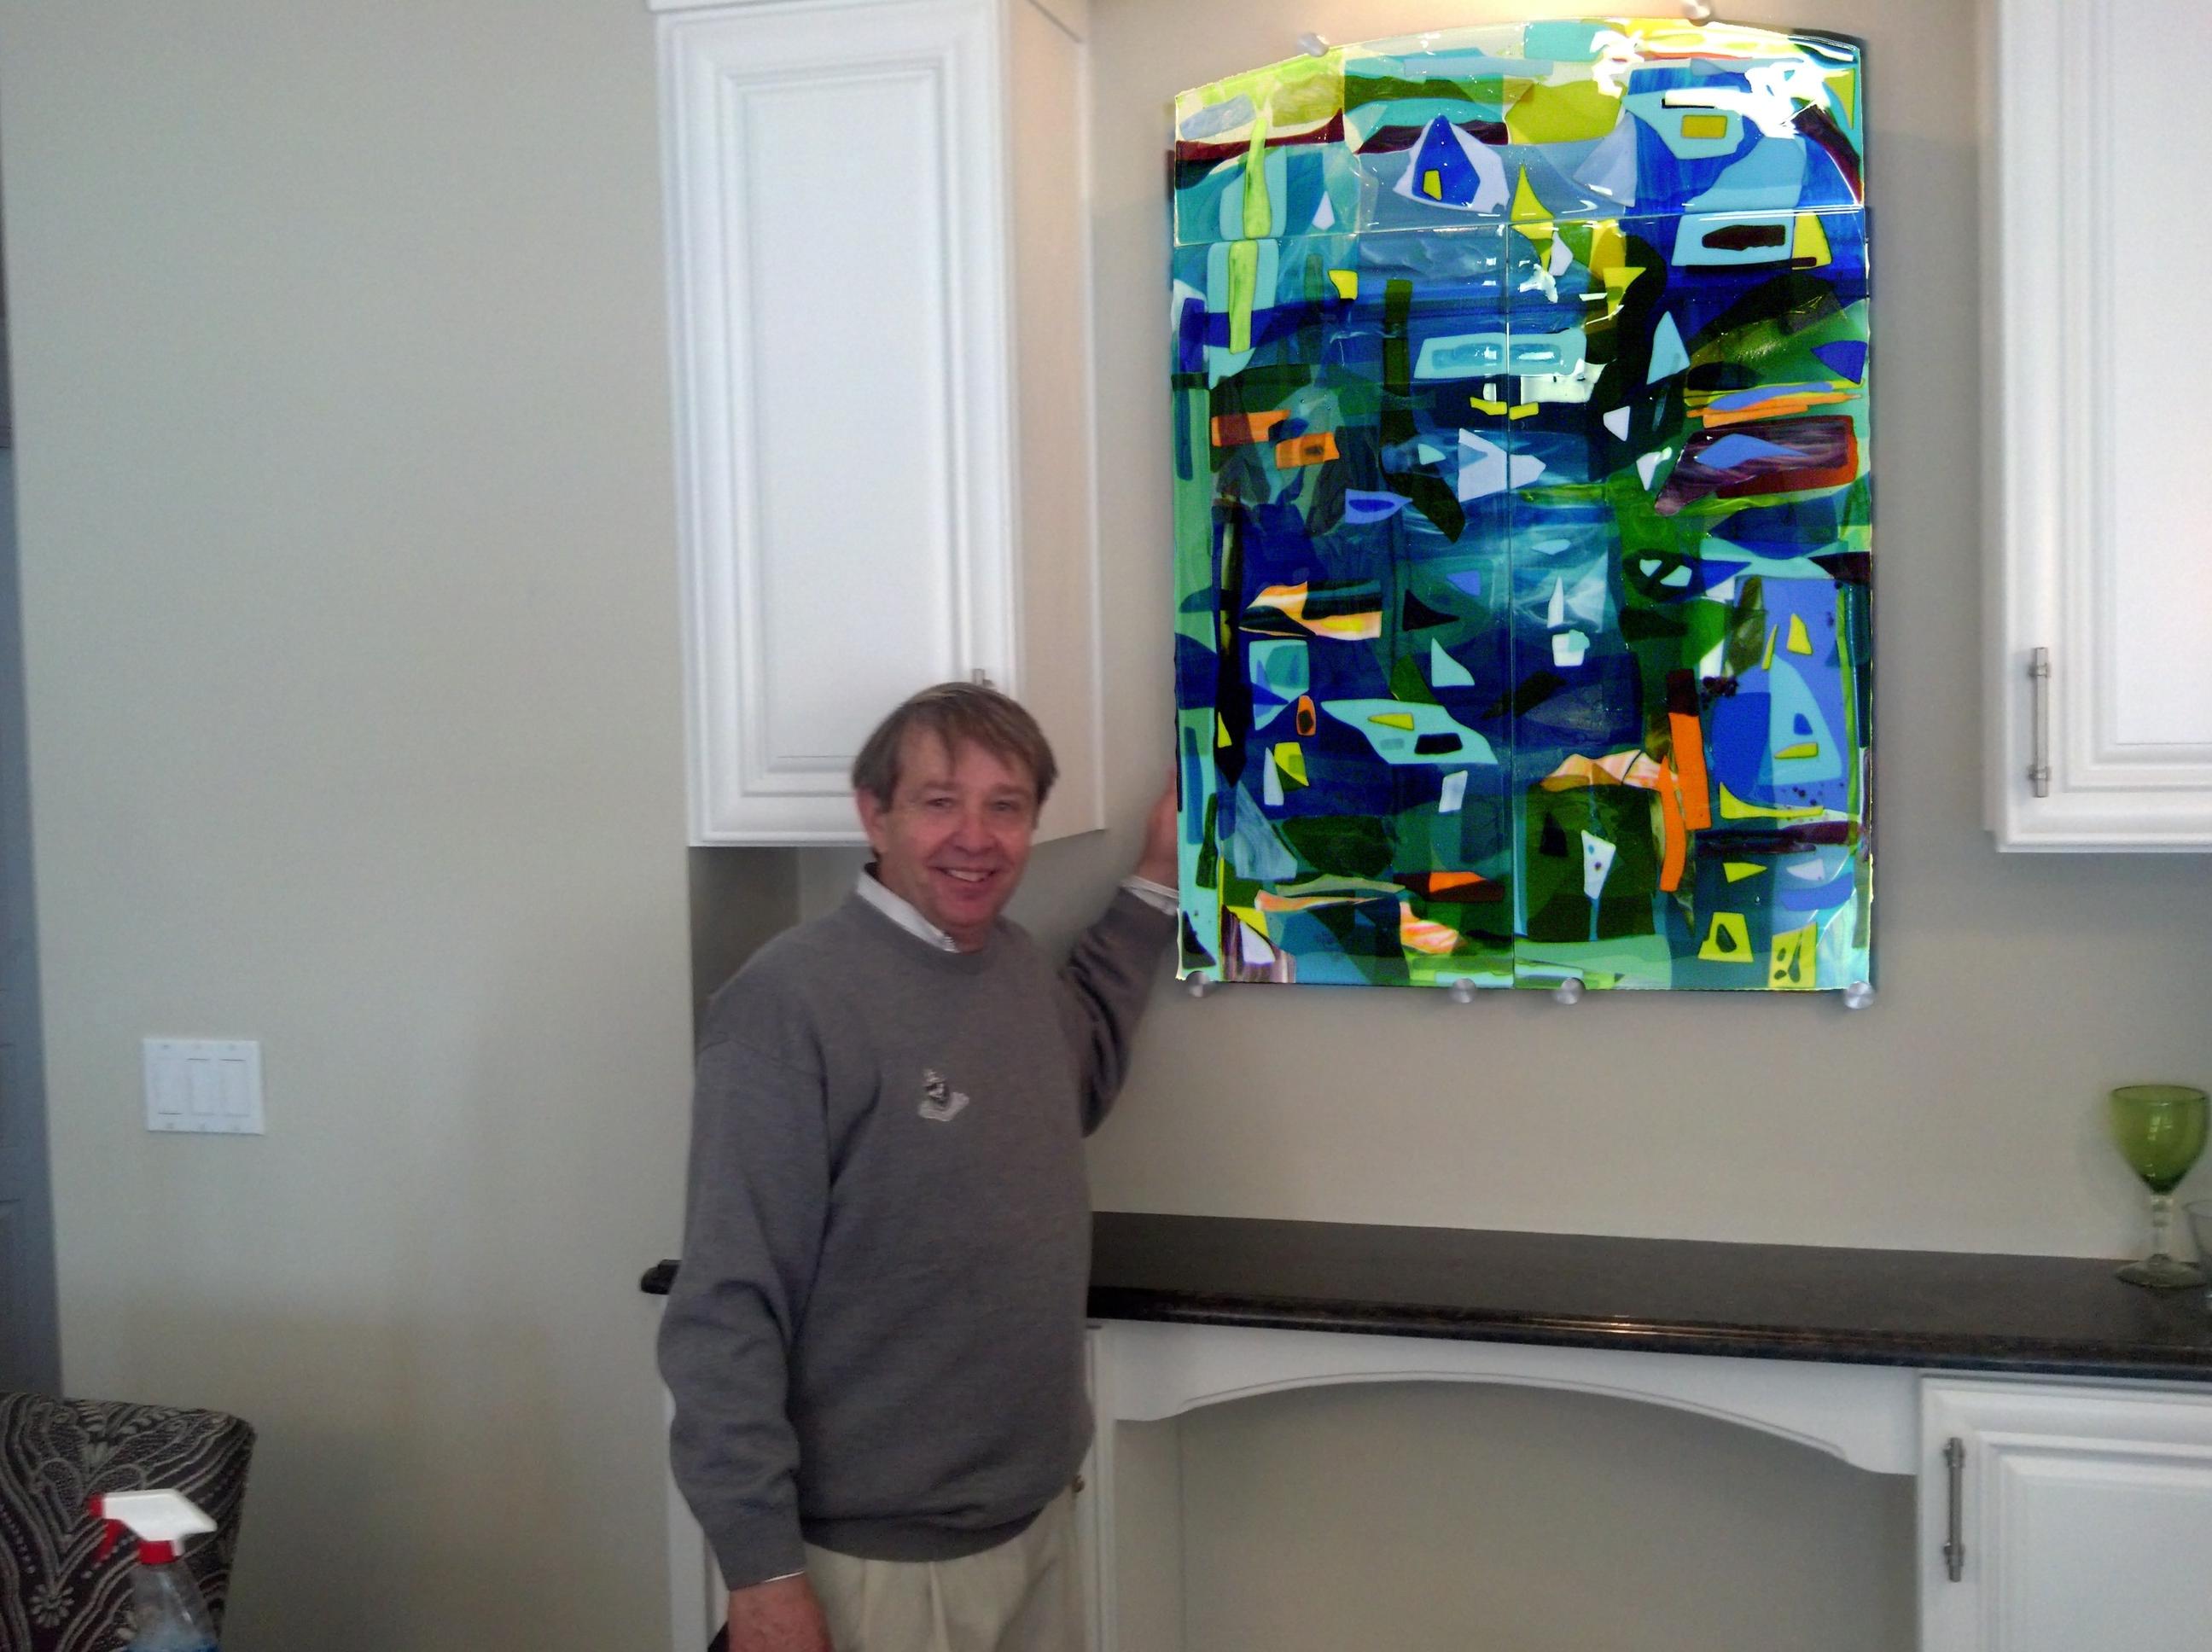 Designer Glass Mosaics (View 2 of 15)